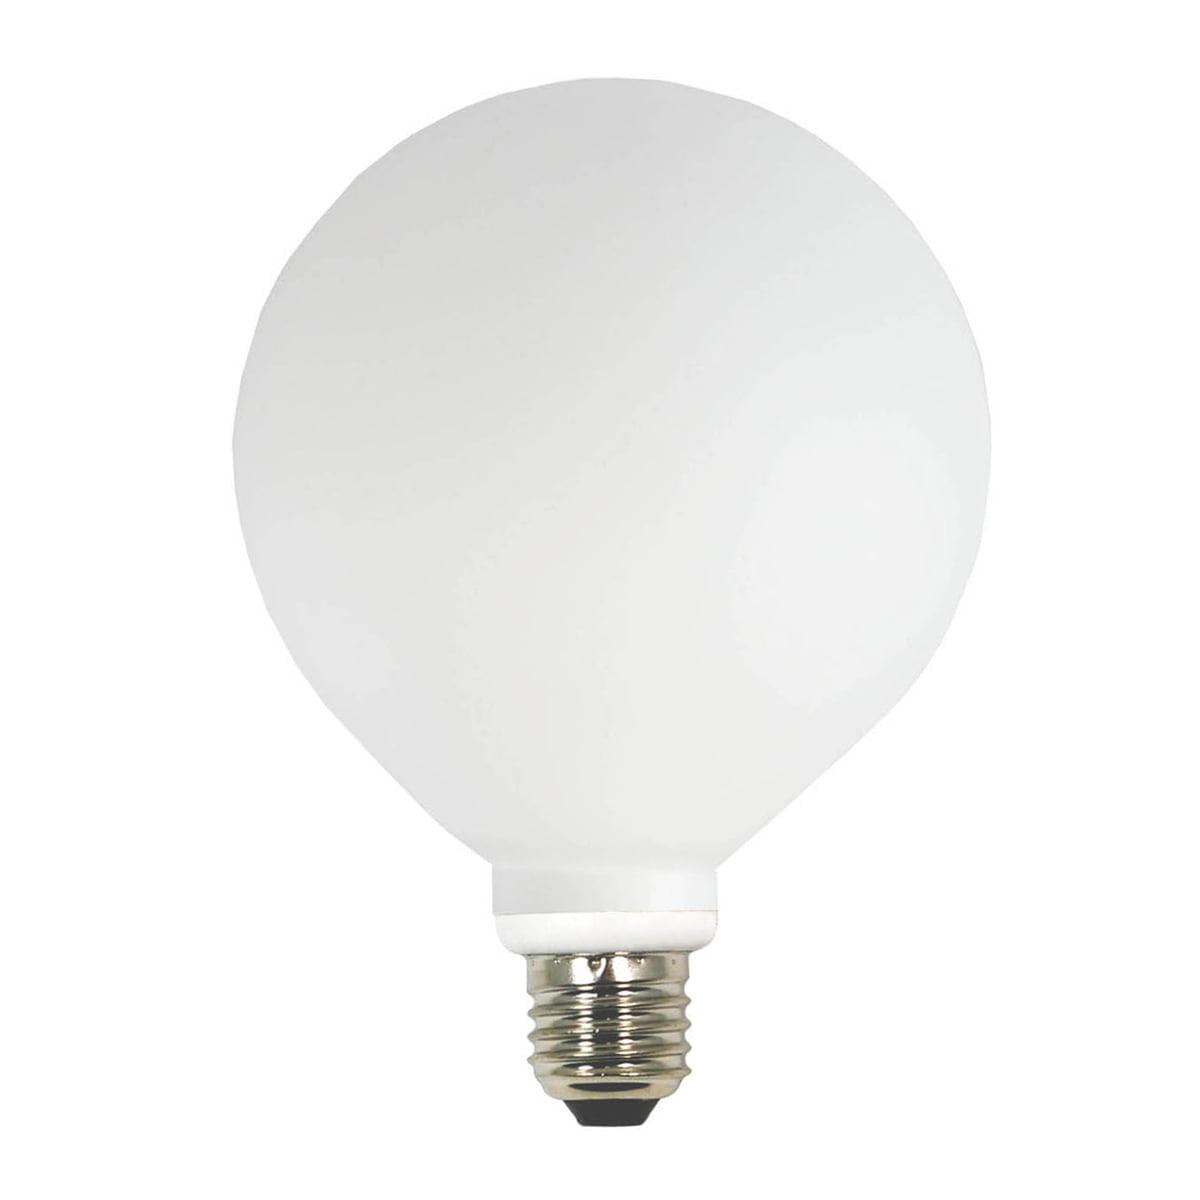 ferm Living - Opal LED-Leuchtmittel 4 W, Ø 125 mm | Lampen > Leuchtmittel > Led | Opalweiß | ferm living